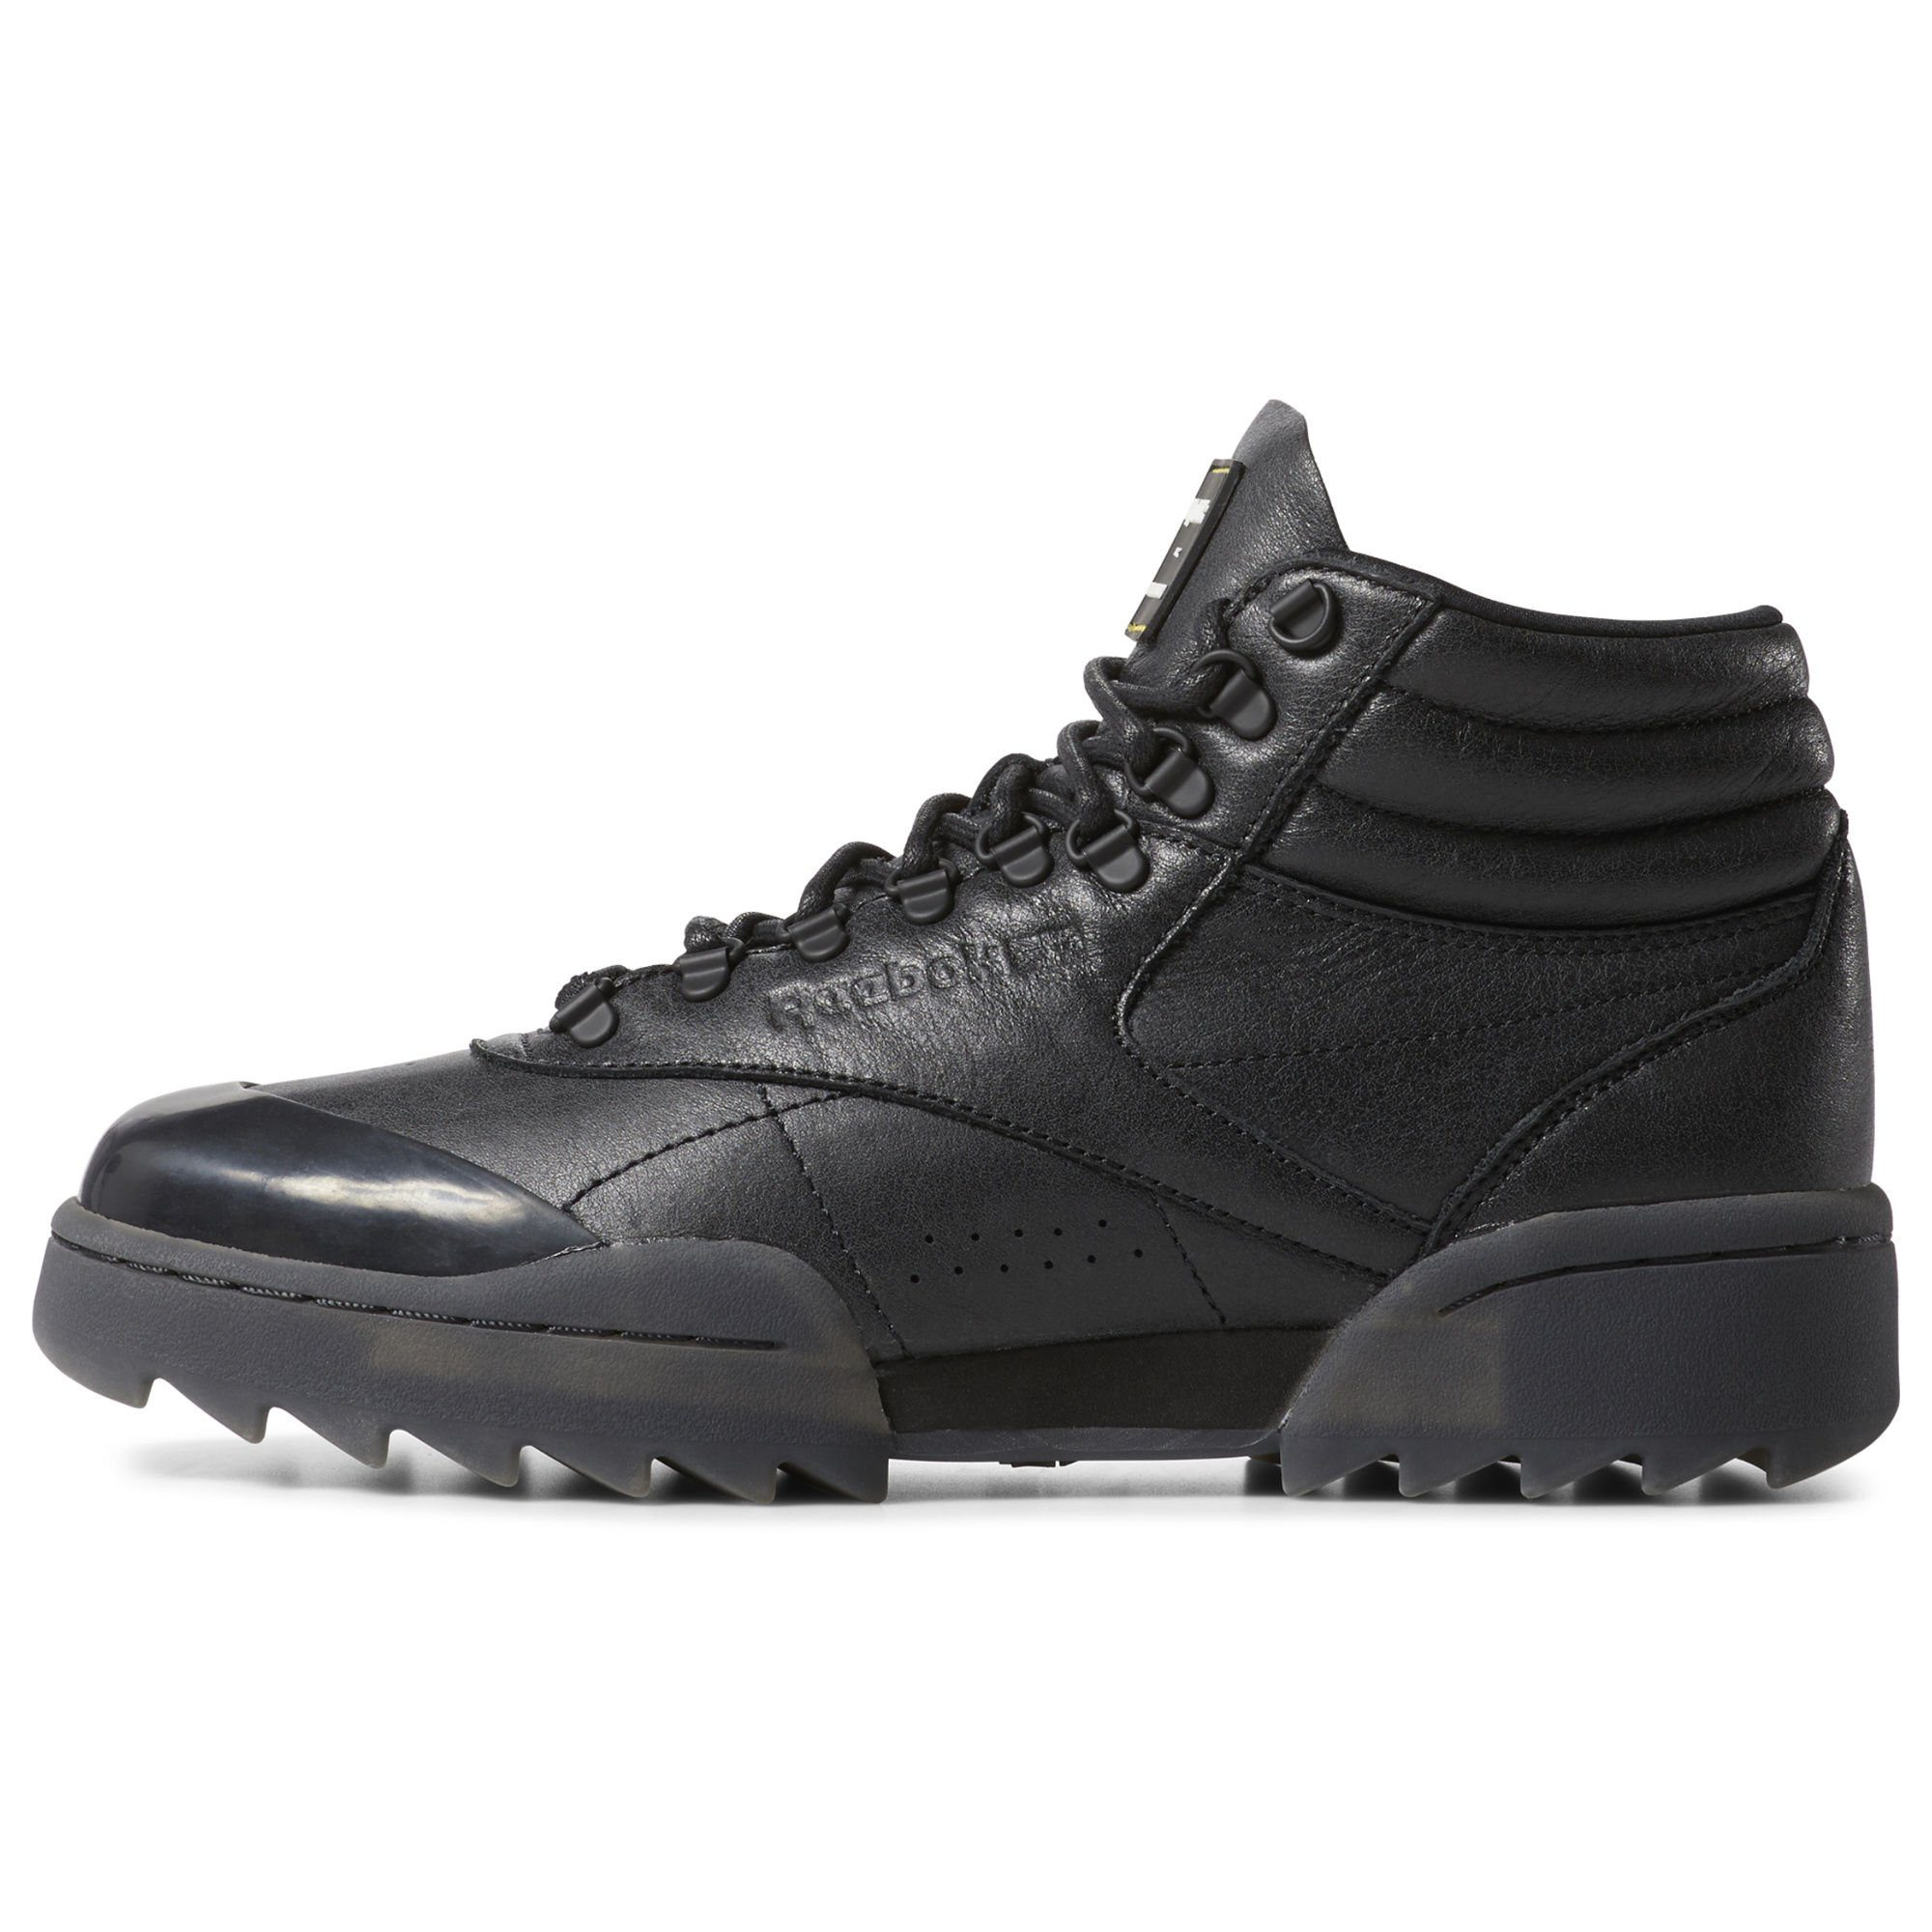 Reebok Classic »Freestyle Hi Nova Ripple x Gigi Hadid« Sneaker online kaufen | OTTO